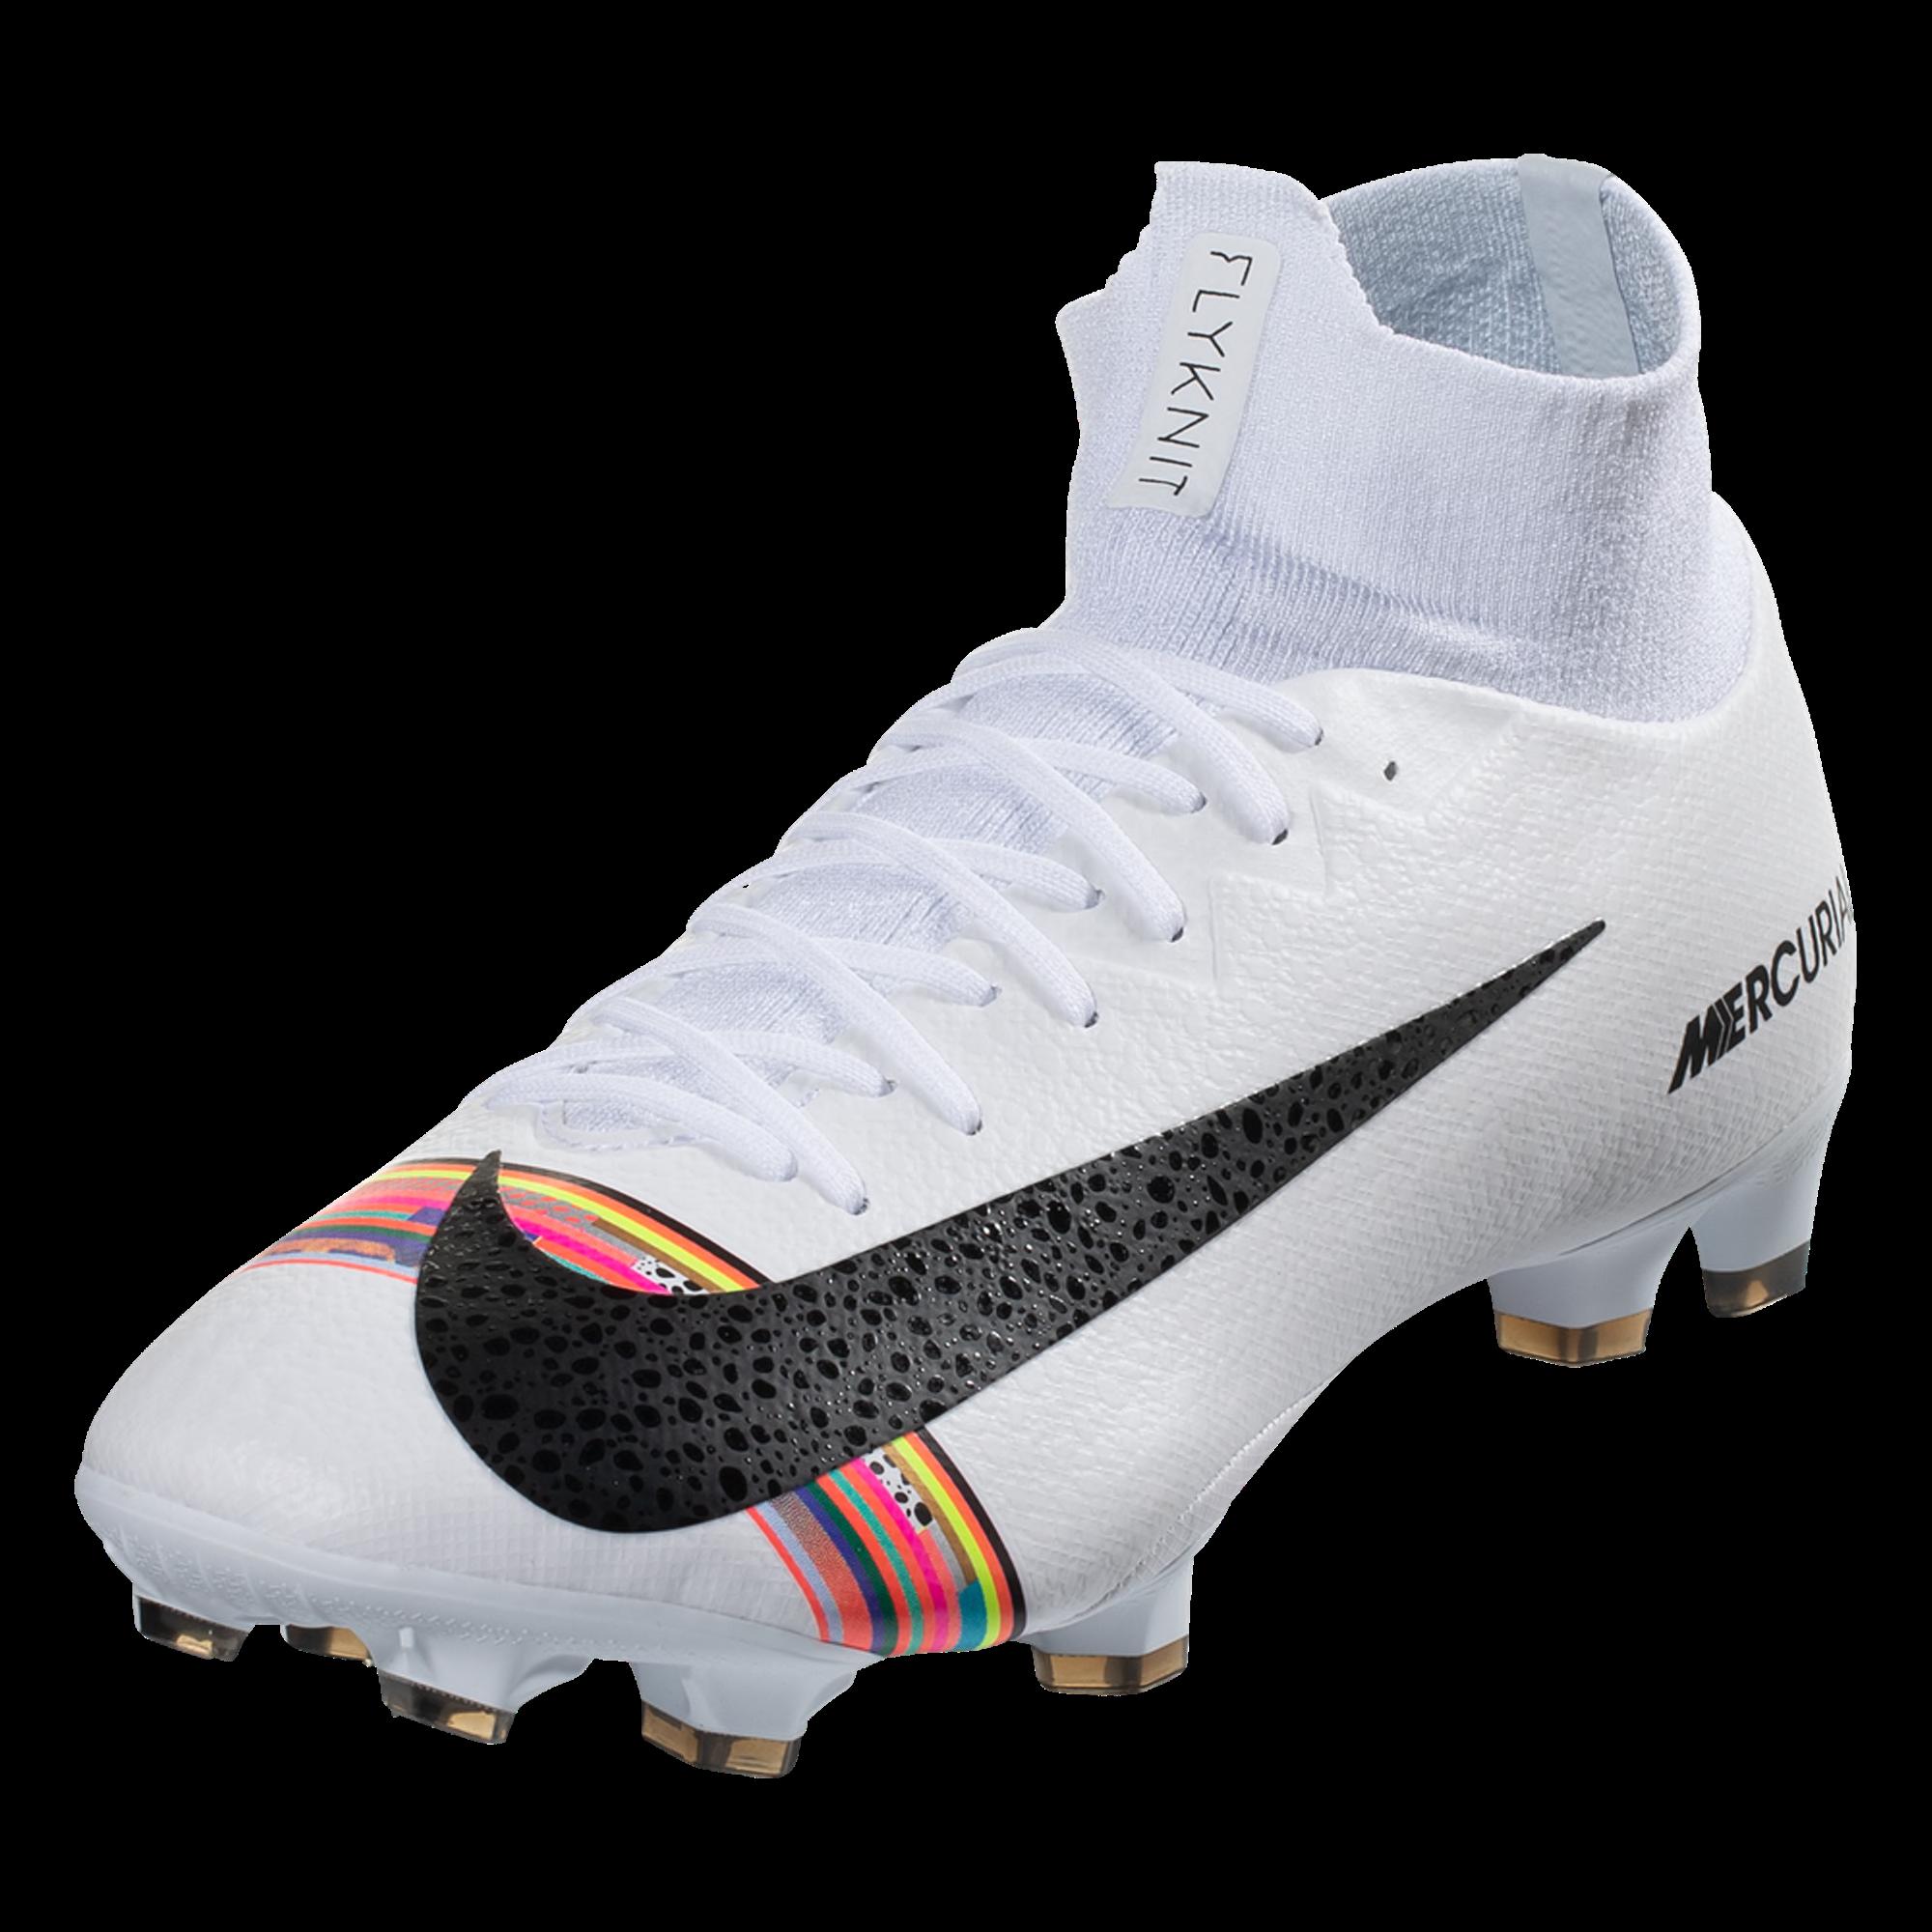 96d4ea45fcdb Nike Mercurial Superfly VI Elite SE FG Soccer Cleat – Platinum/Black/White